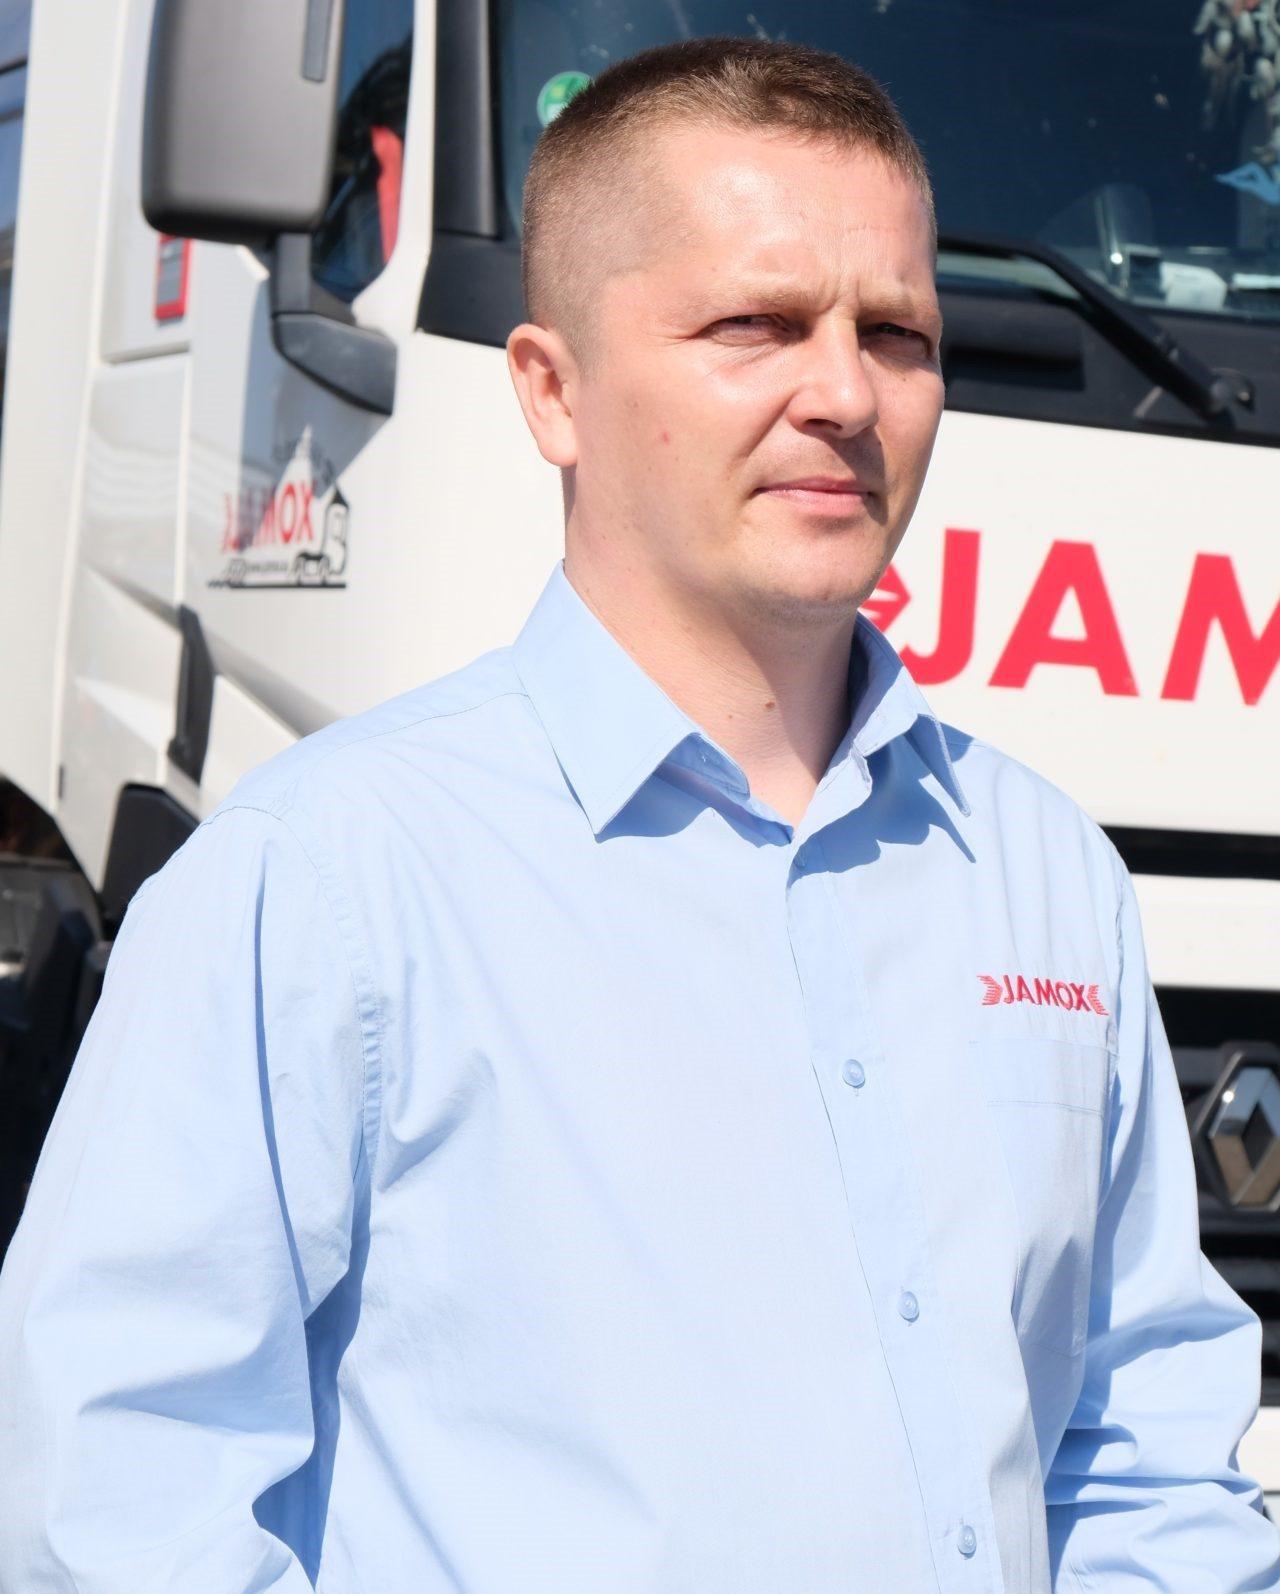 http://jamox.eu/wp-content/uploads/2019/05/DSCF3090-1280x1920-e1557578858988.jpg